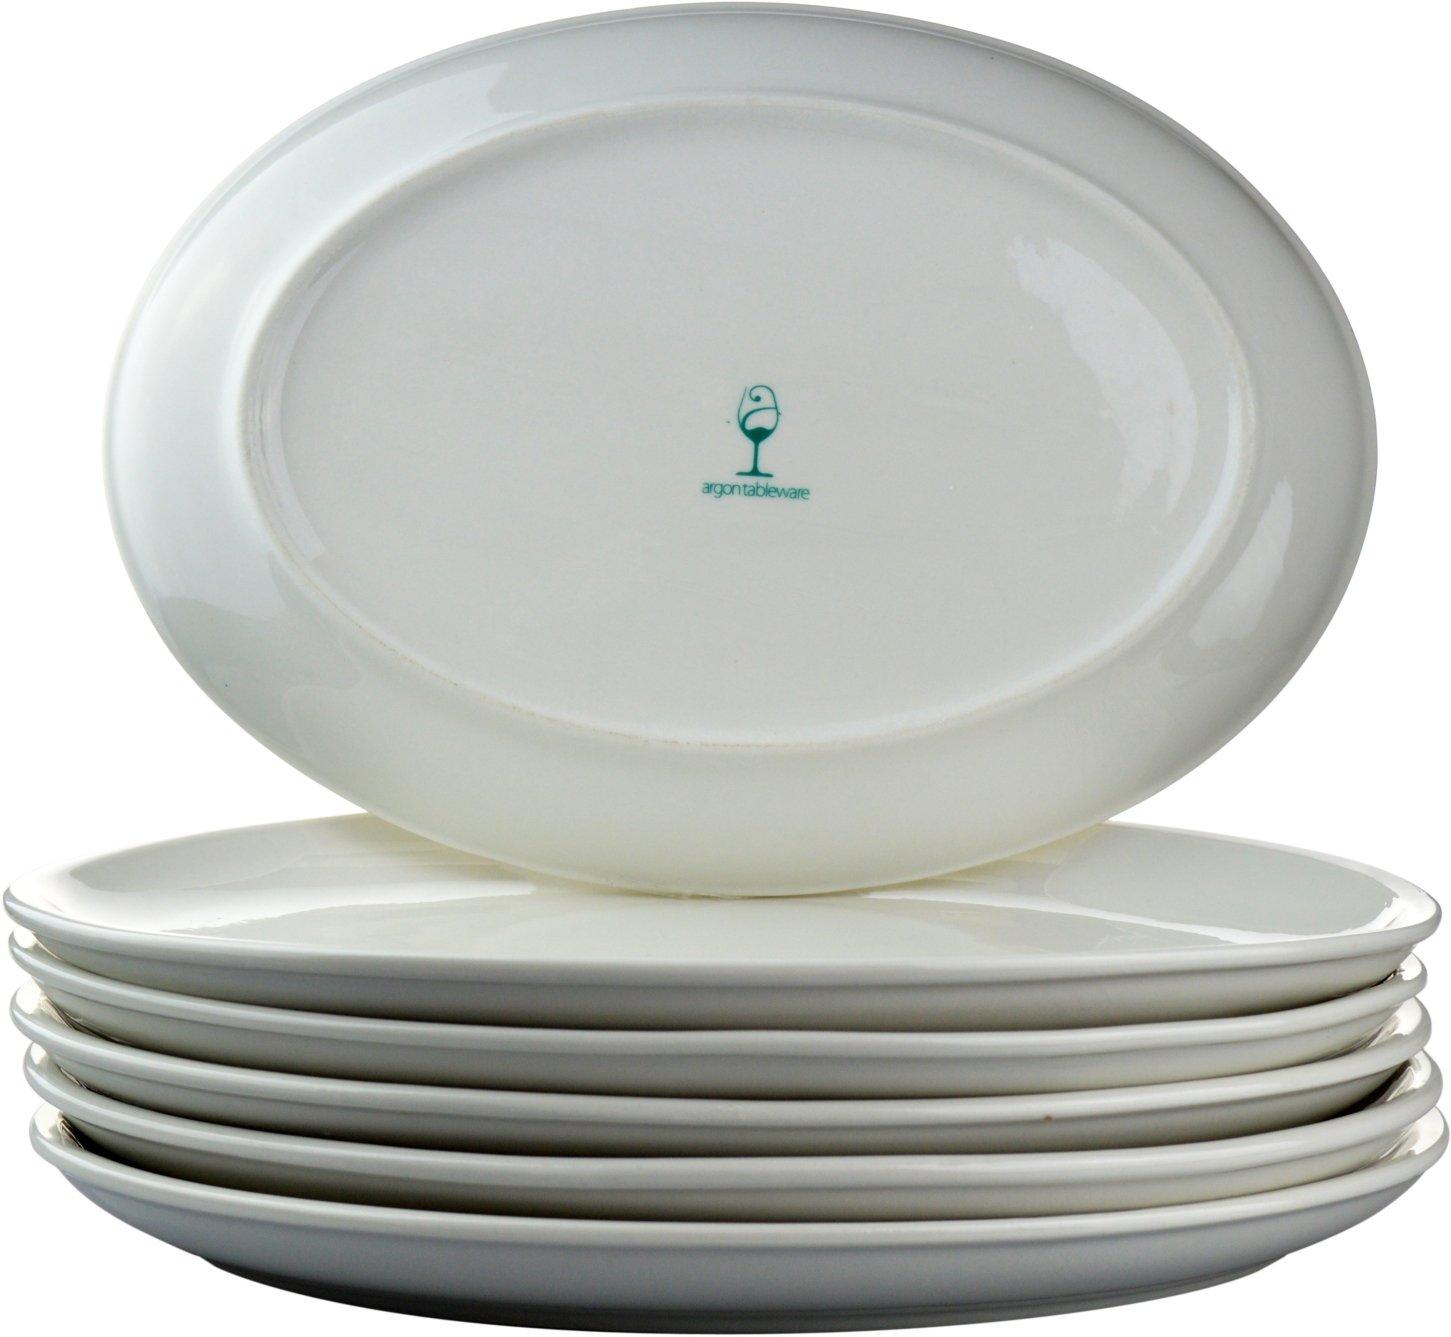 Argon Tableware White Oval Coupe Plates - 300x215mm (12x8.5\ ) - Box of 6 Amazon.co.uk Kitchen \u0026 Home  sc 1 st  Amazon UK & Argon Tableware White Oval Coupe Plates - 300x215mm (12x8.5\